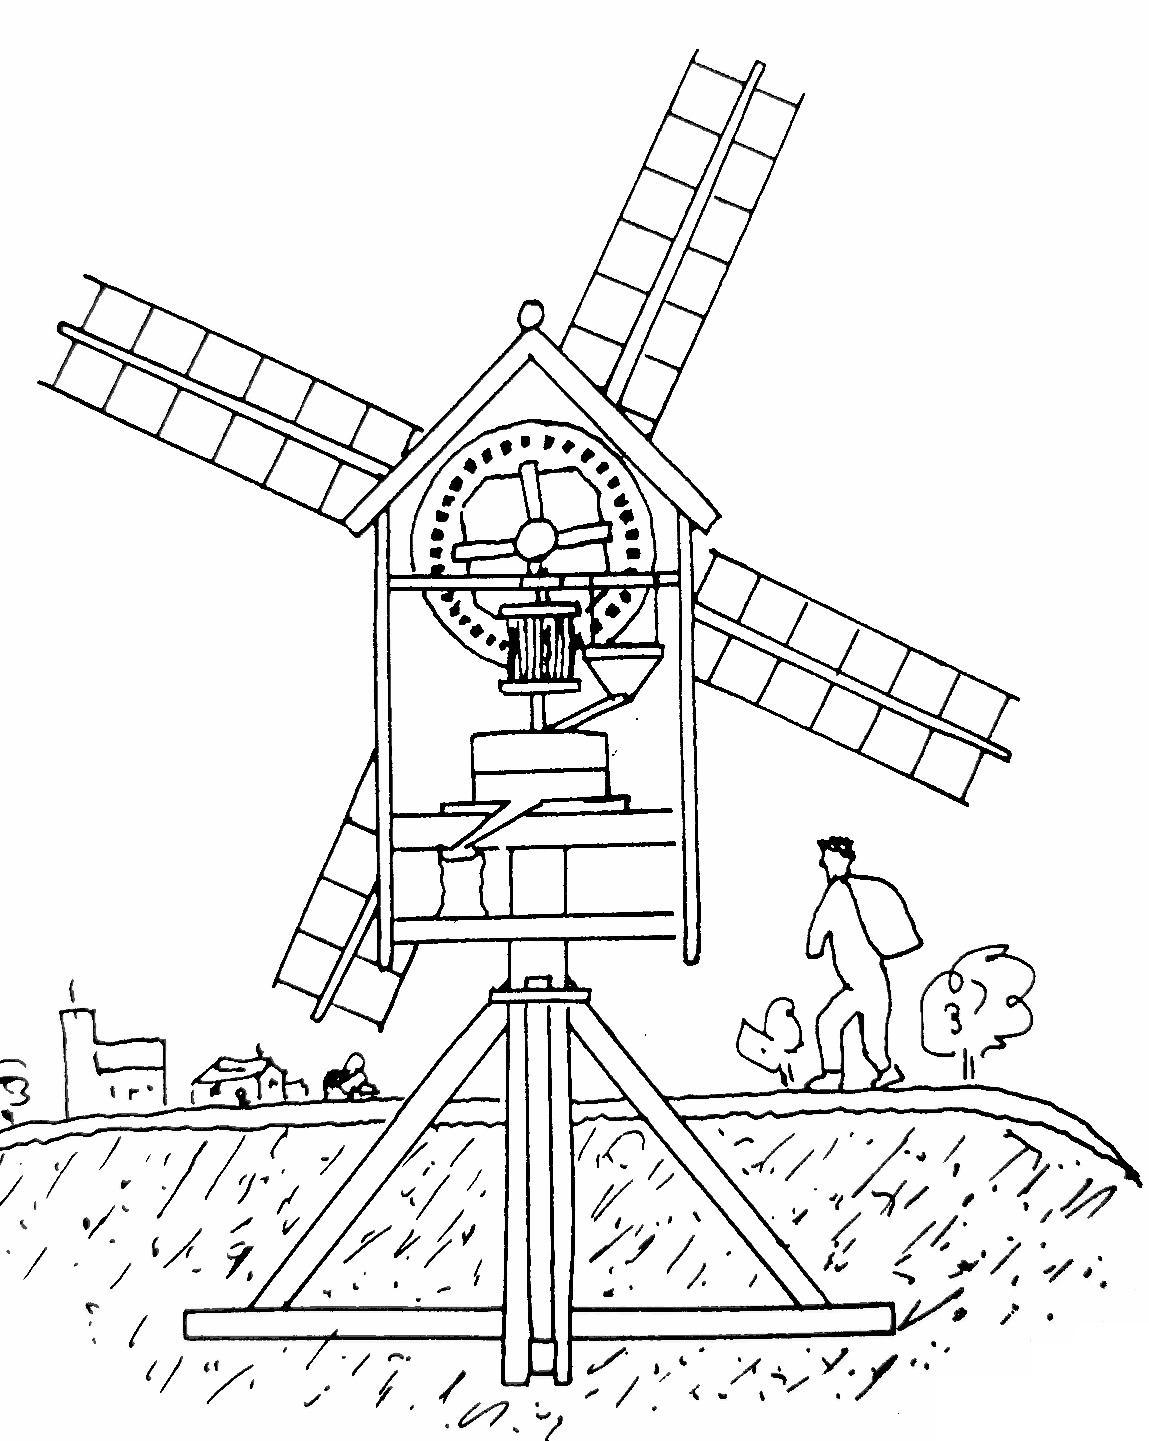 1149x1441 Iama Miller On A Dutch Windmill, Ama! Iama